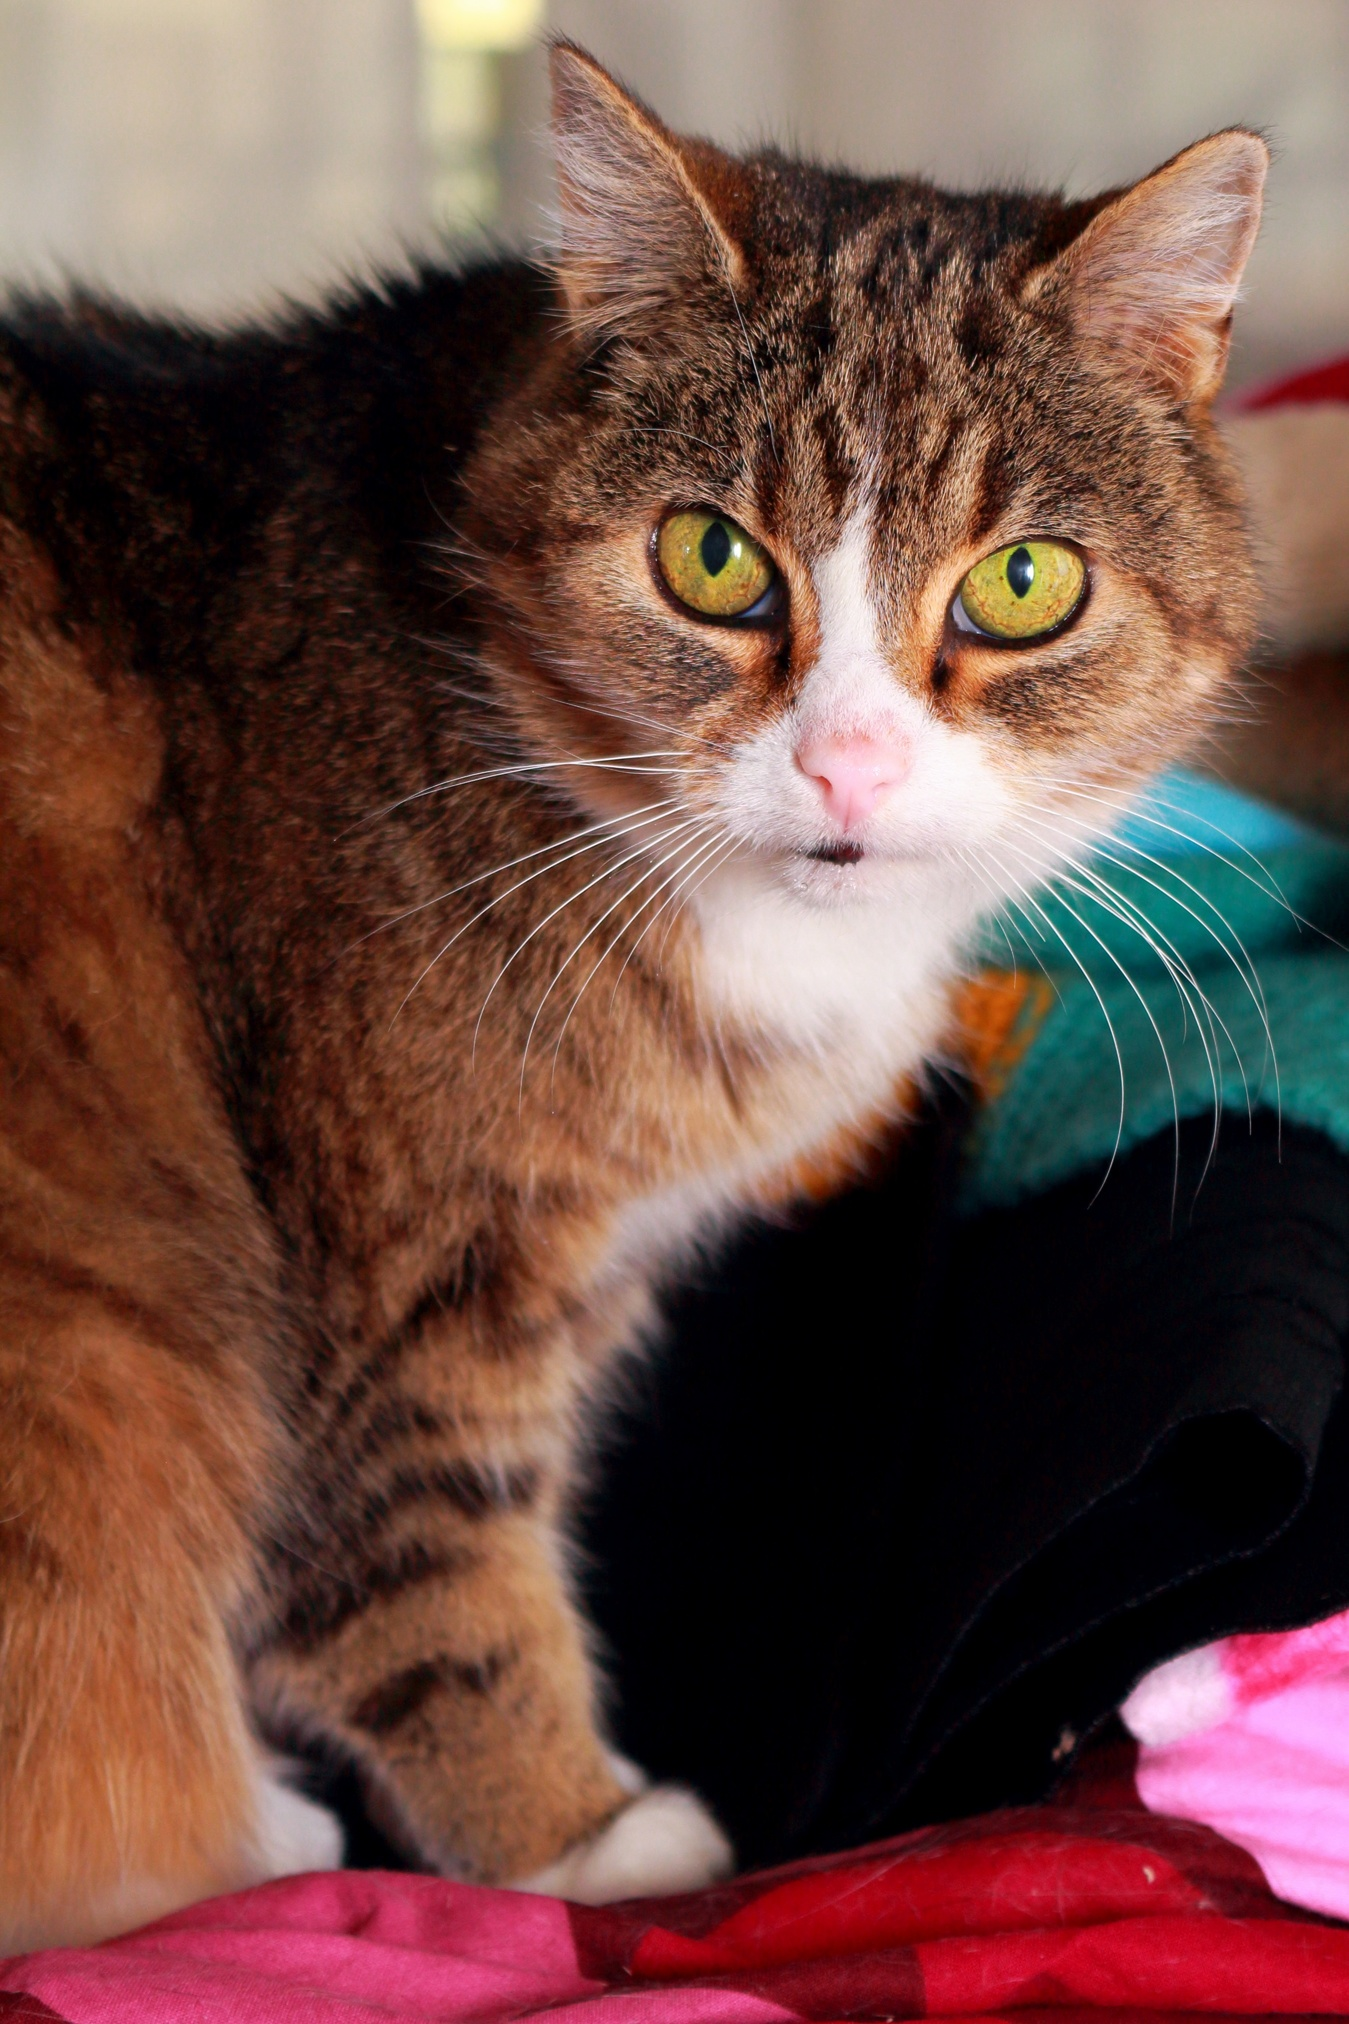 My shorthair cat is very photogenic